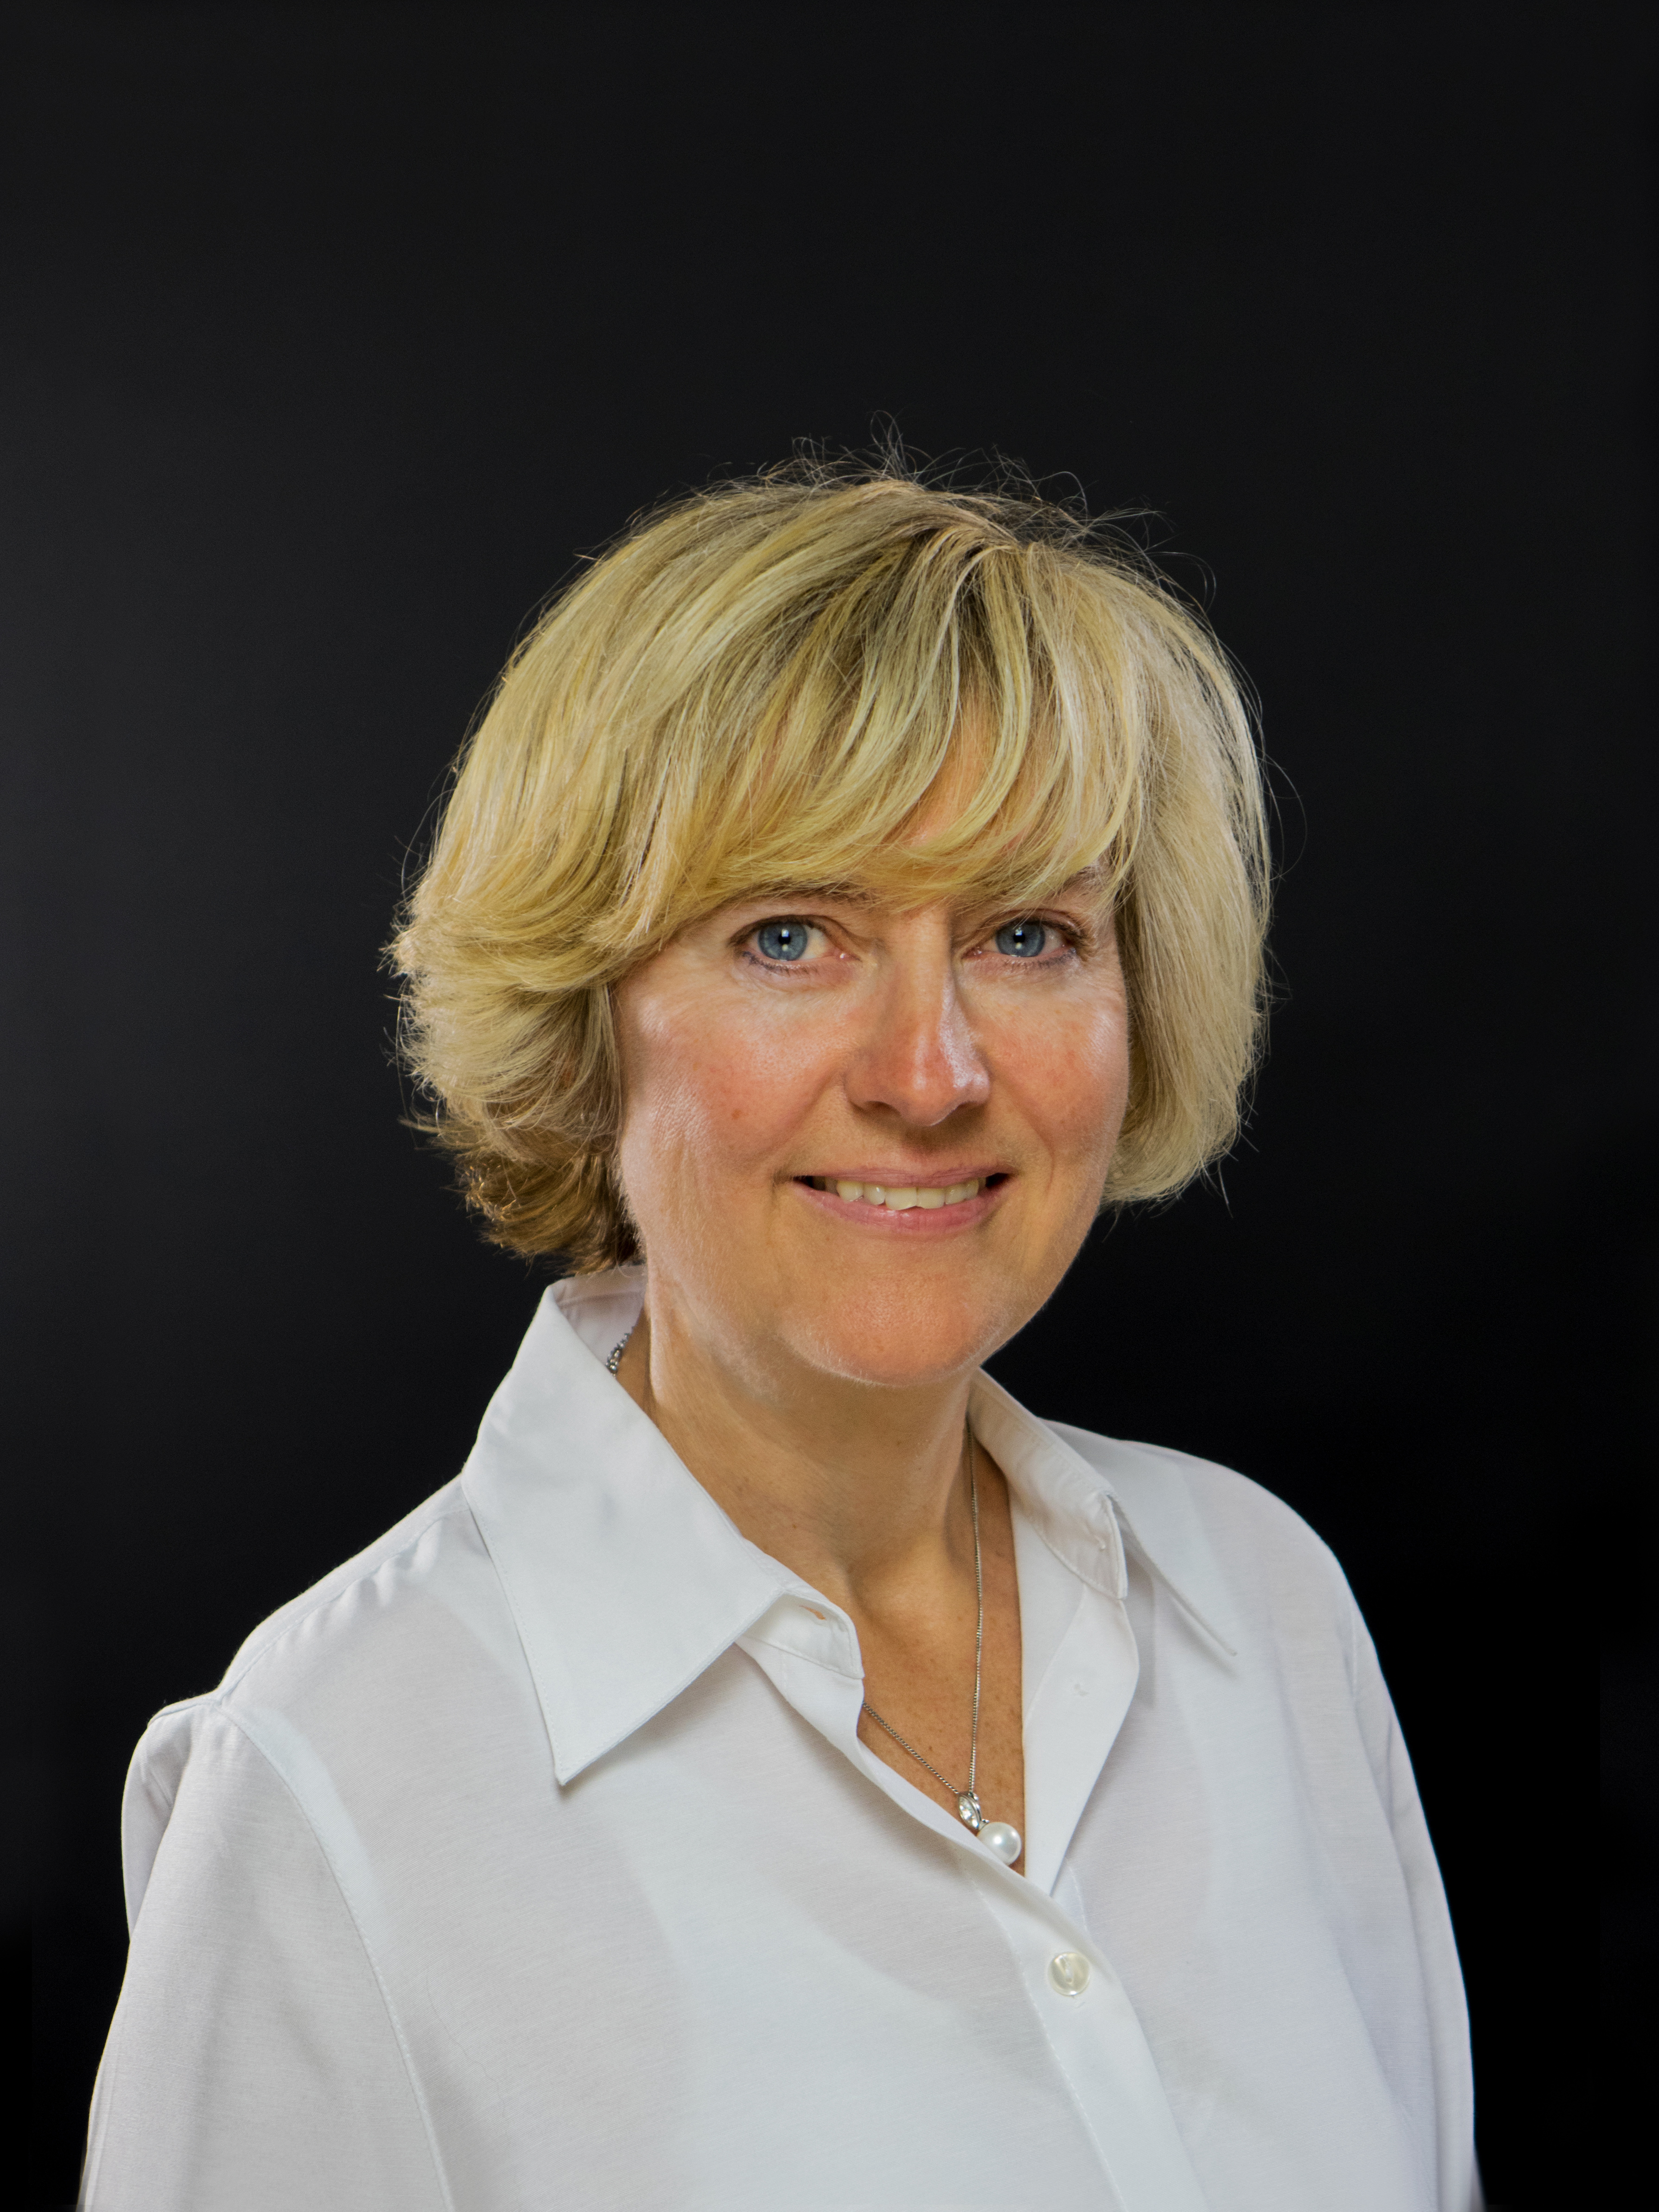 Susanne Biesenbach